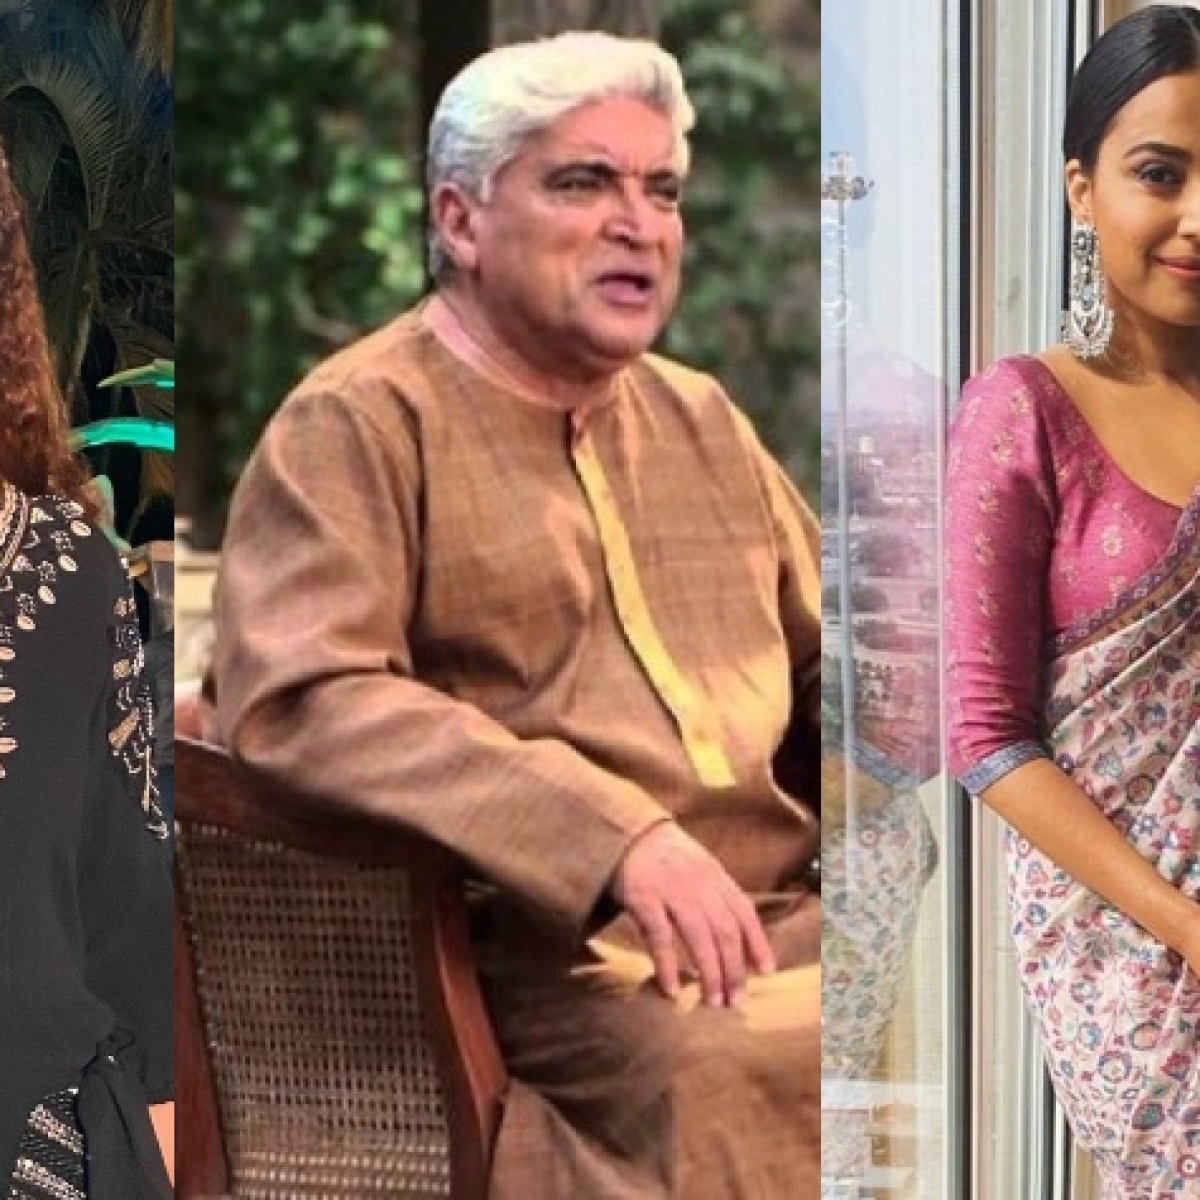 Palghar lynching: Raveena Tandon, Swara Bhasker, Javed Akhtar condemn the 'heinous crime'